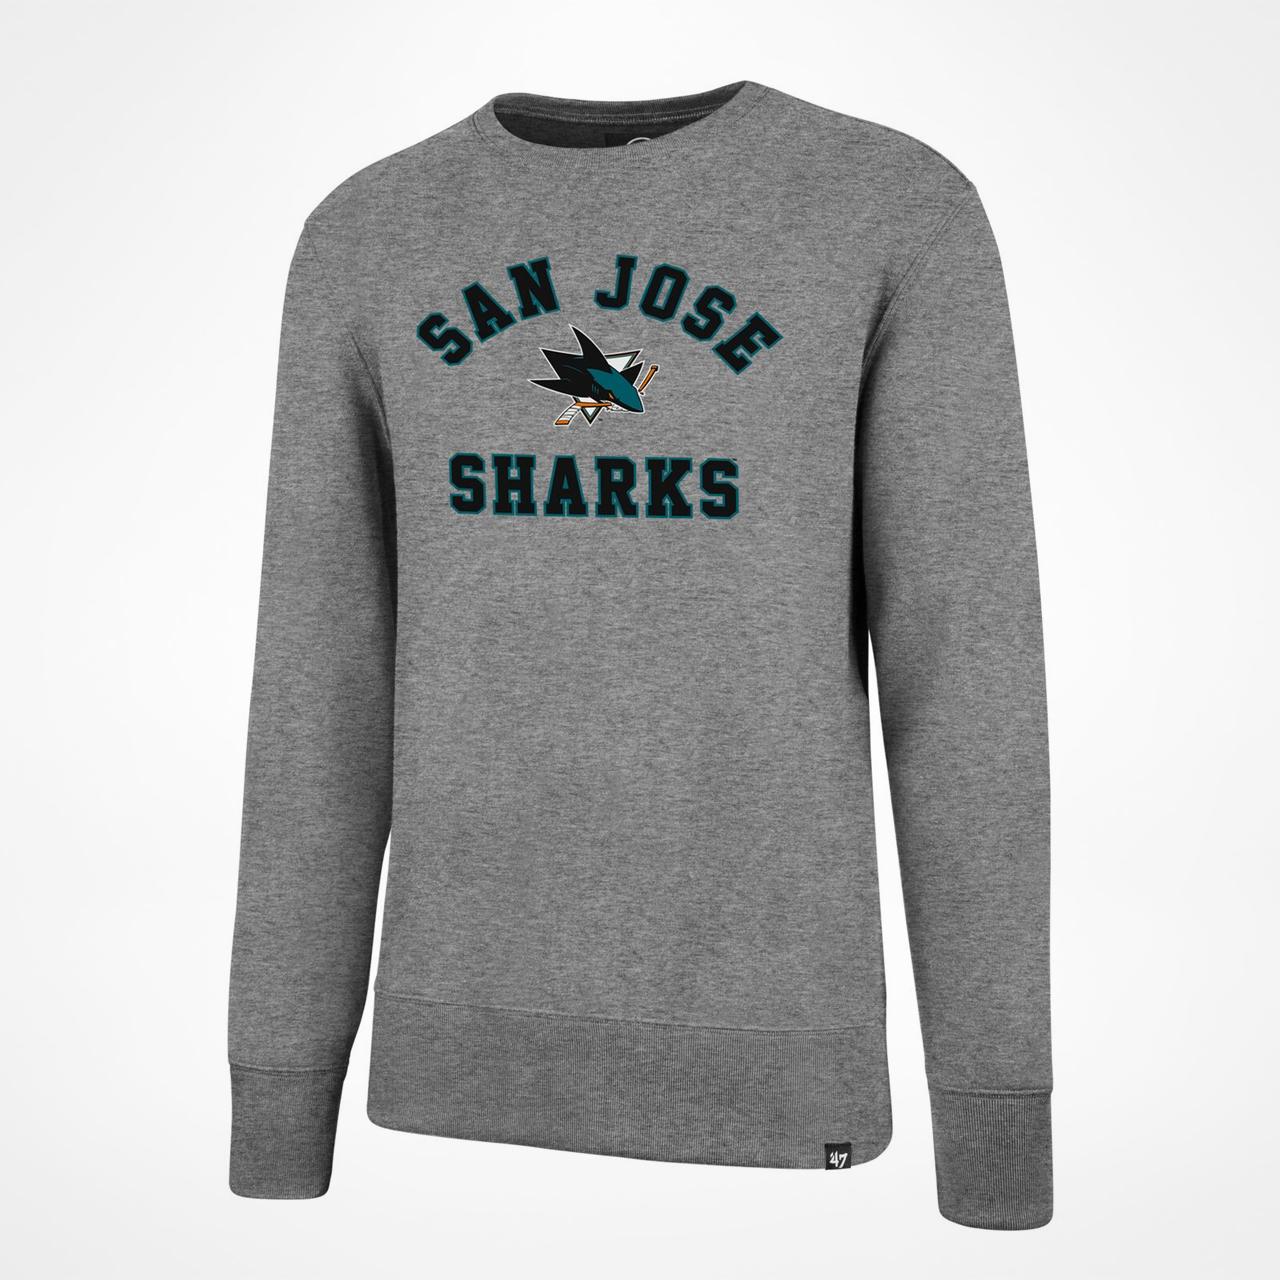 Jose Sweat shirt Genser